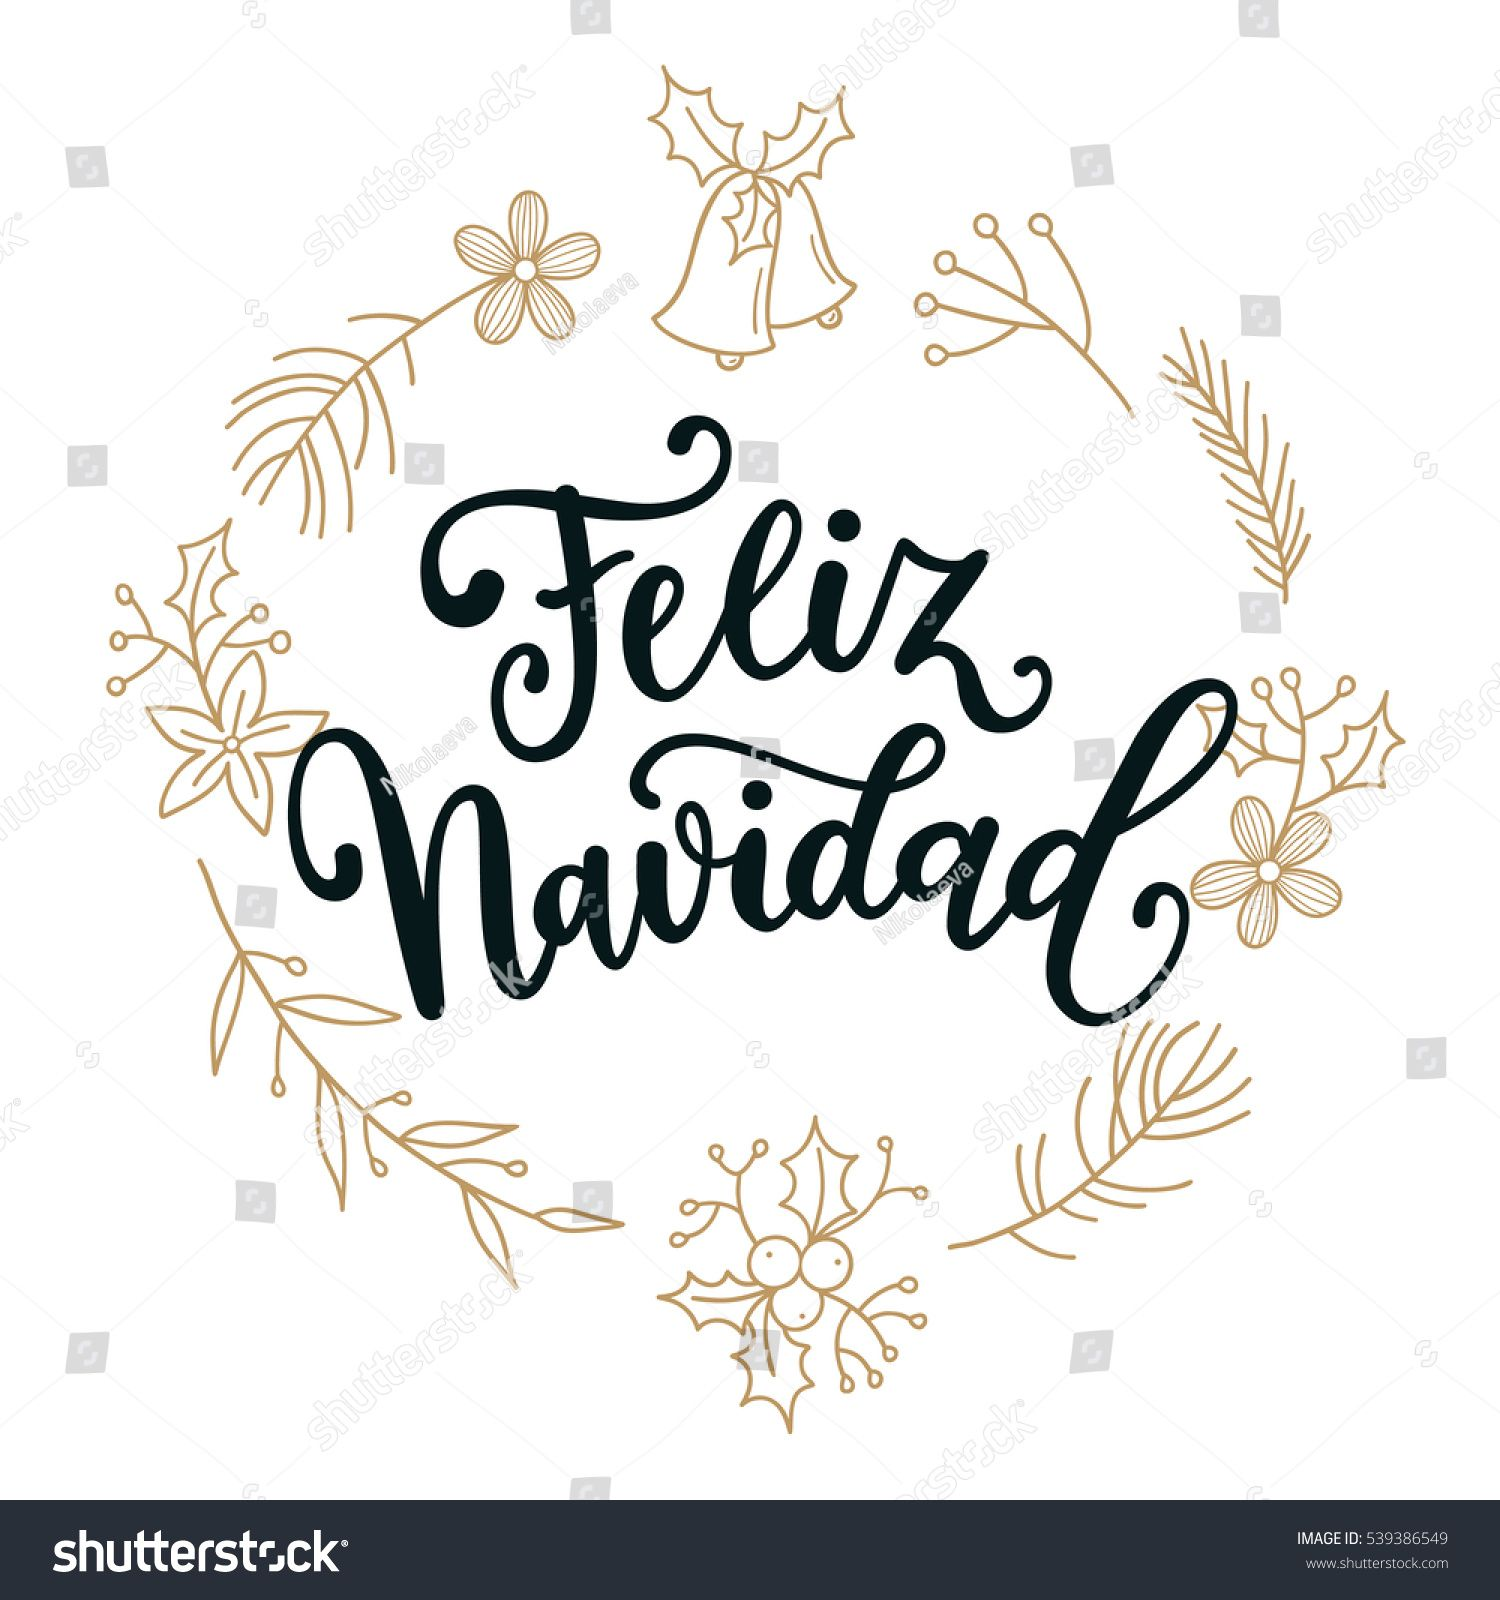 Feliz Navidad. Holidays greeting card with Spanish phrase means ...